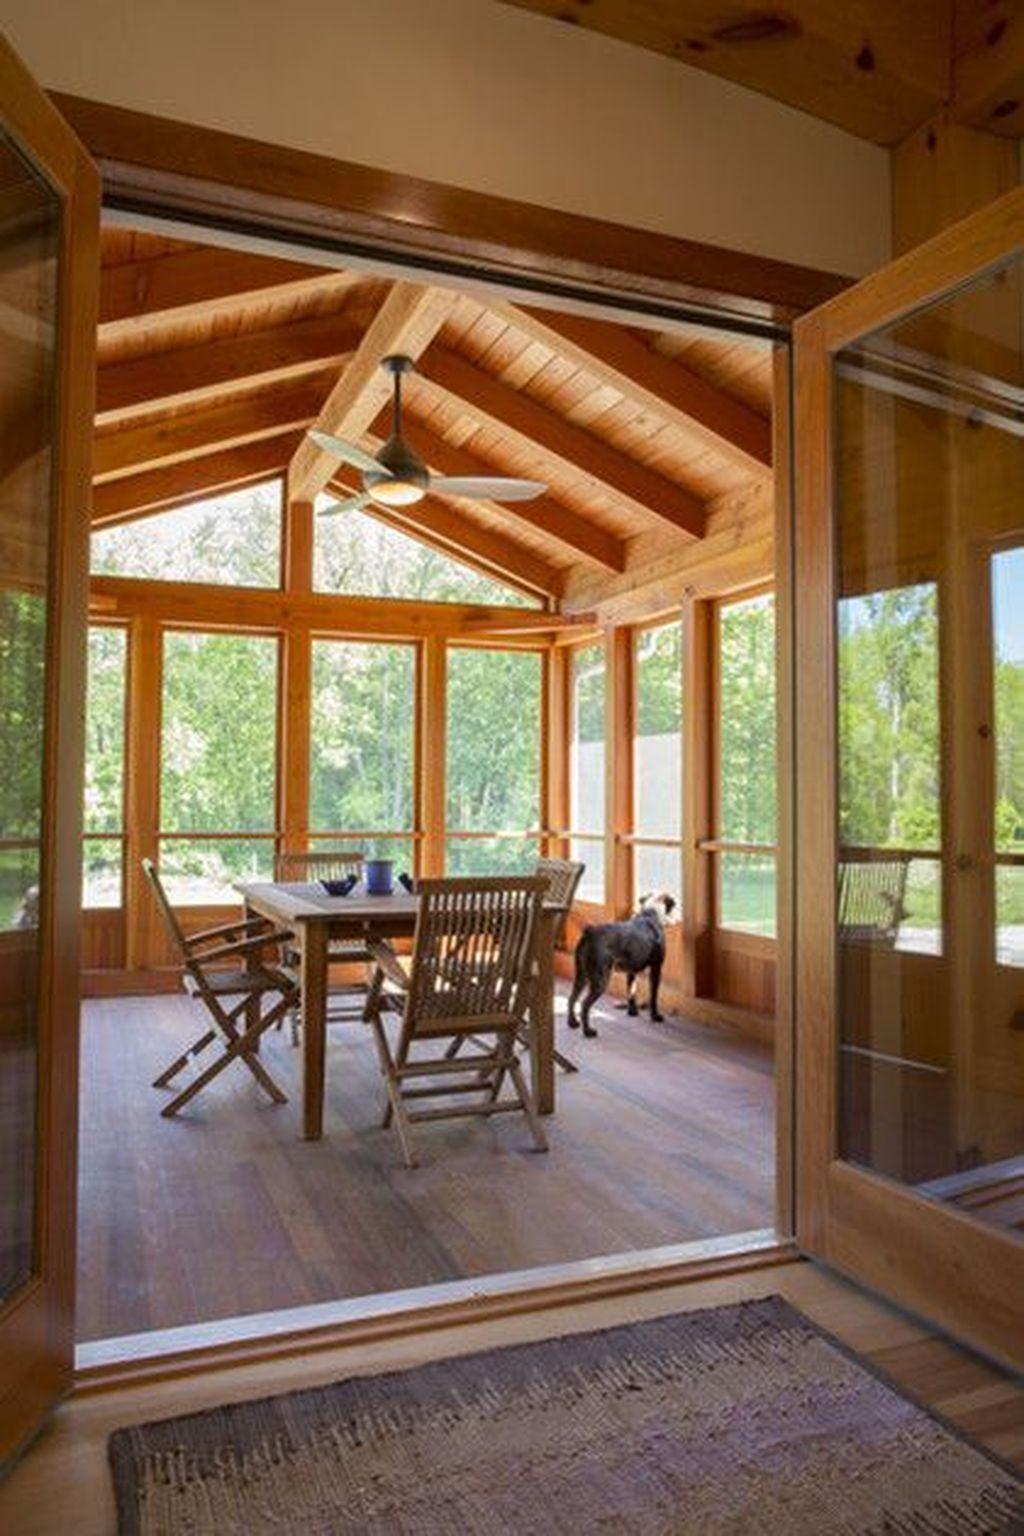 Photo of 38 Inexpensive Family Room Design Ideas For Backyard Garden